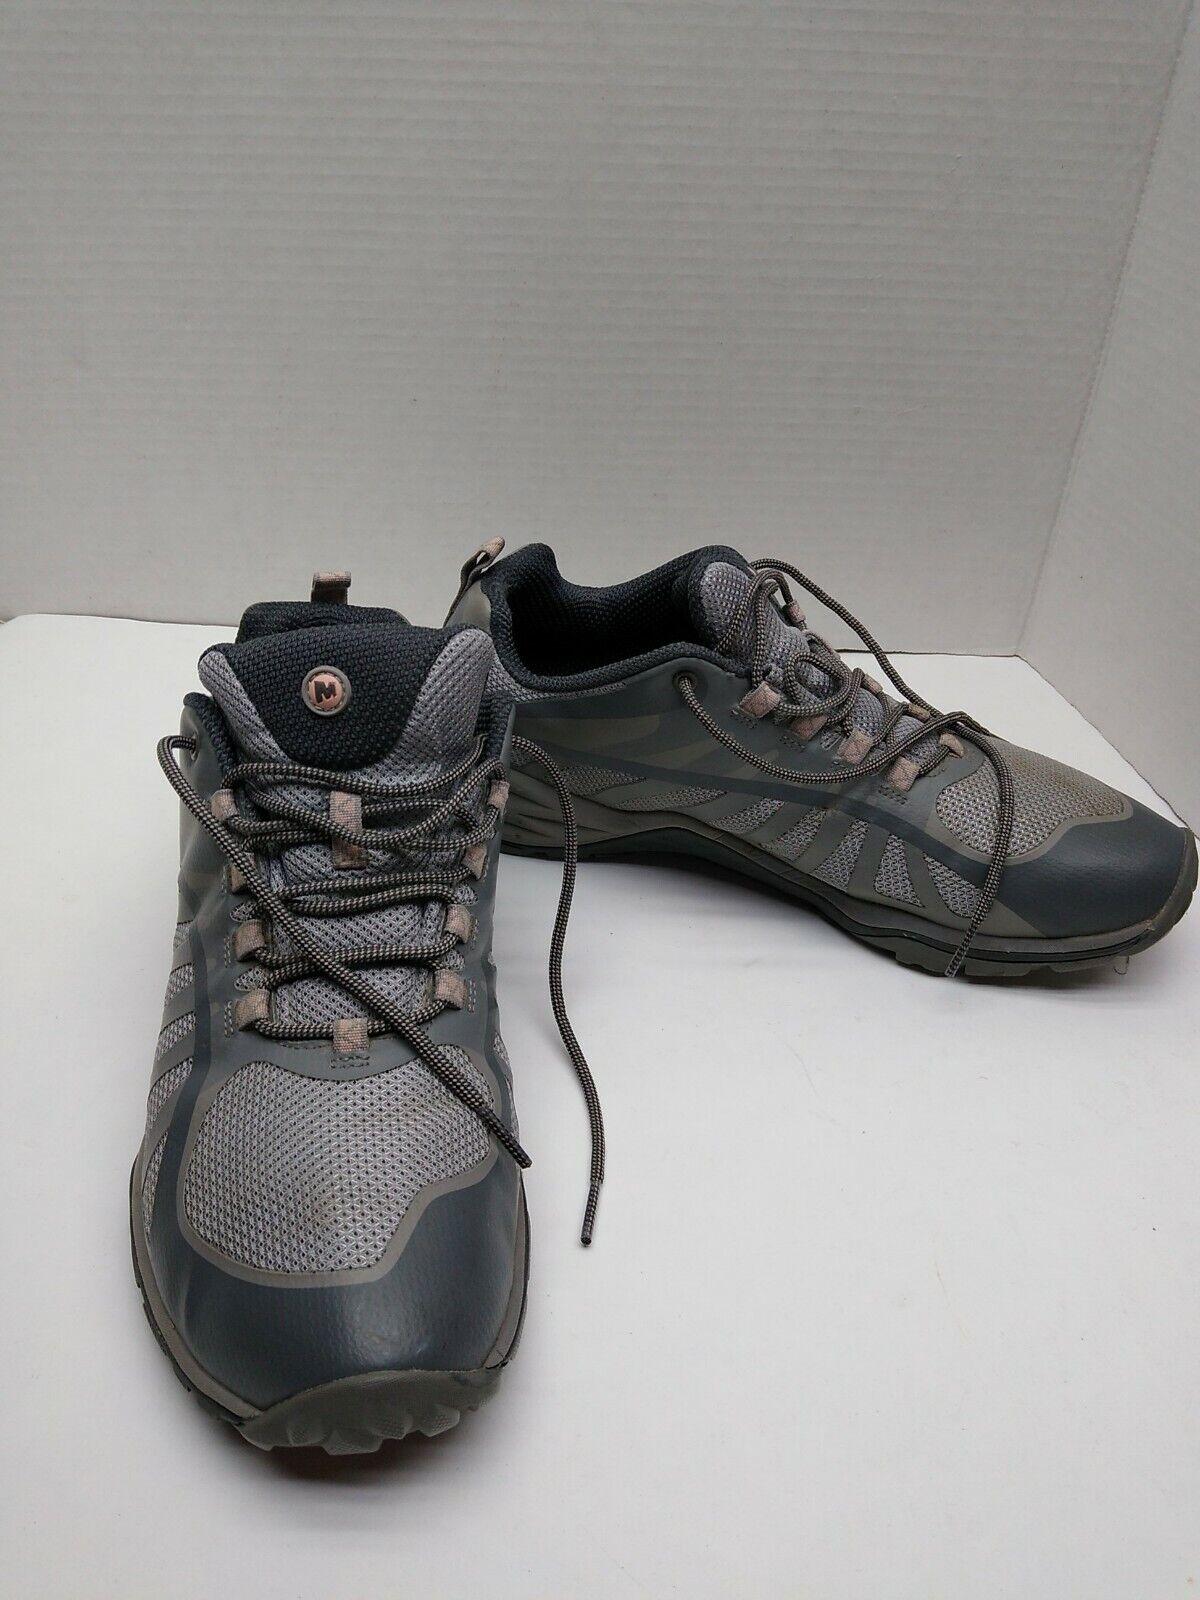 NWOB J65412 Merrell Womens SIREN EDGE Q2 Purple Hiking Trail Shoes Sz 7 7.5 8